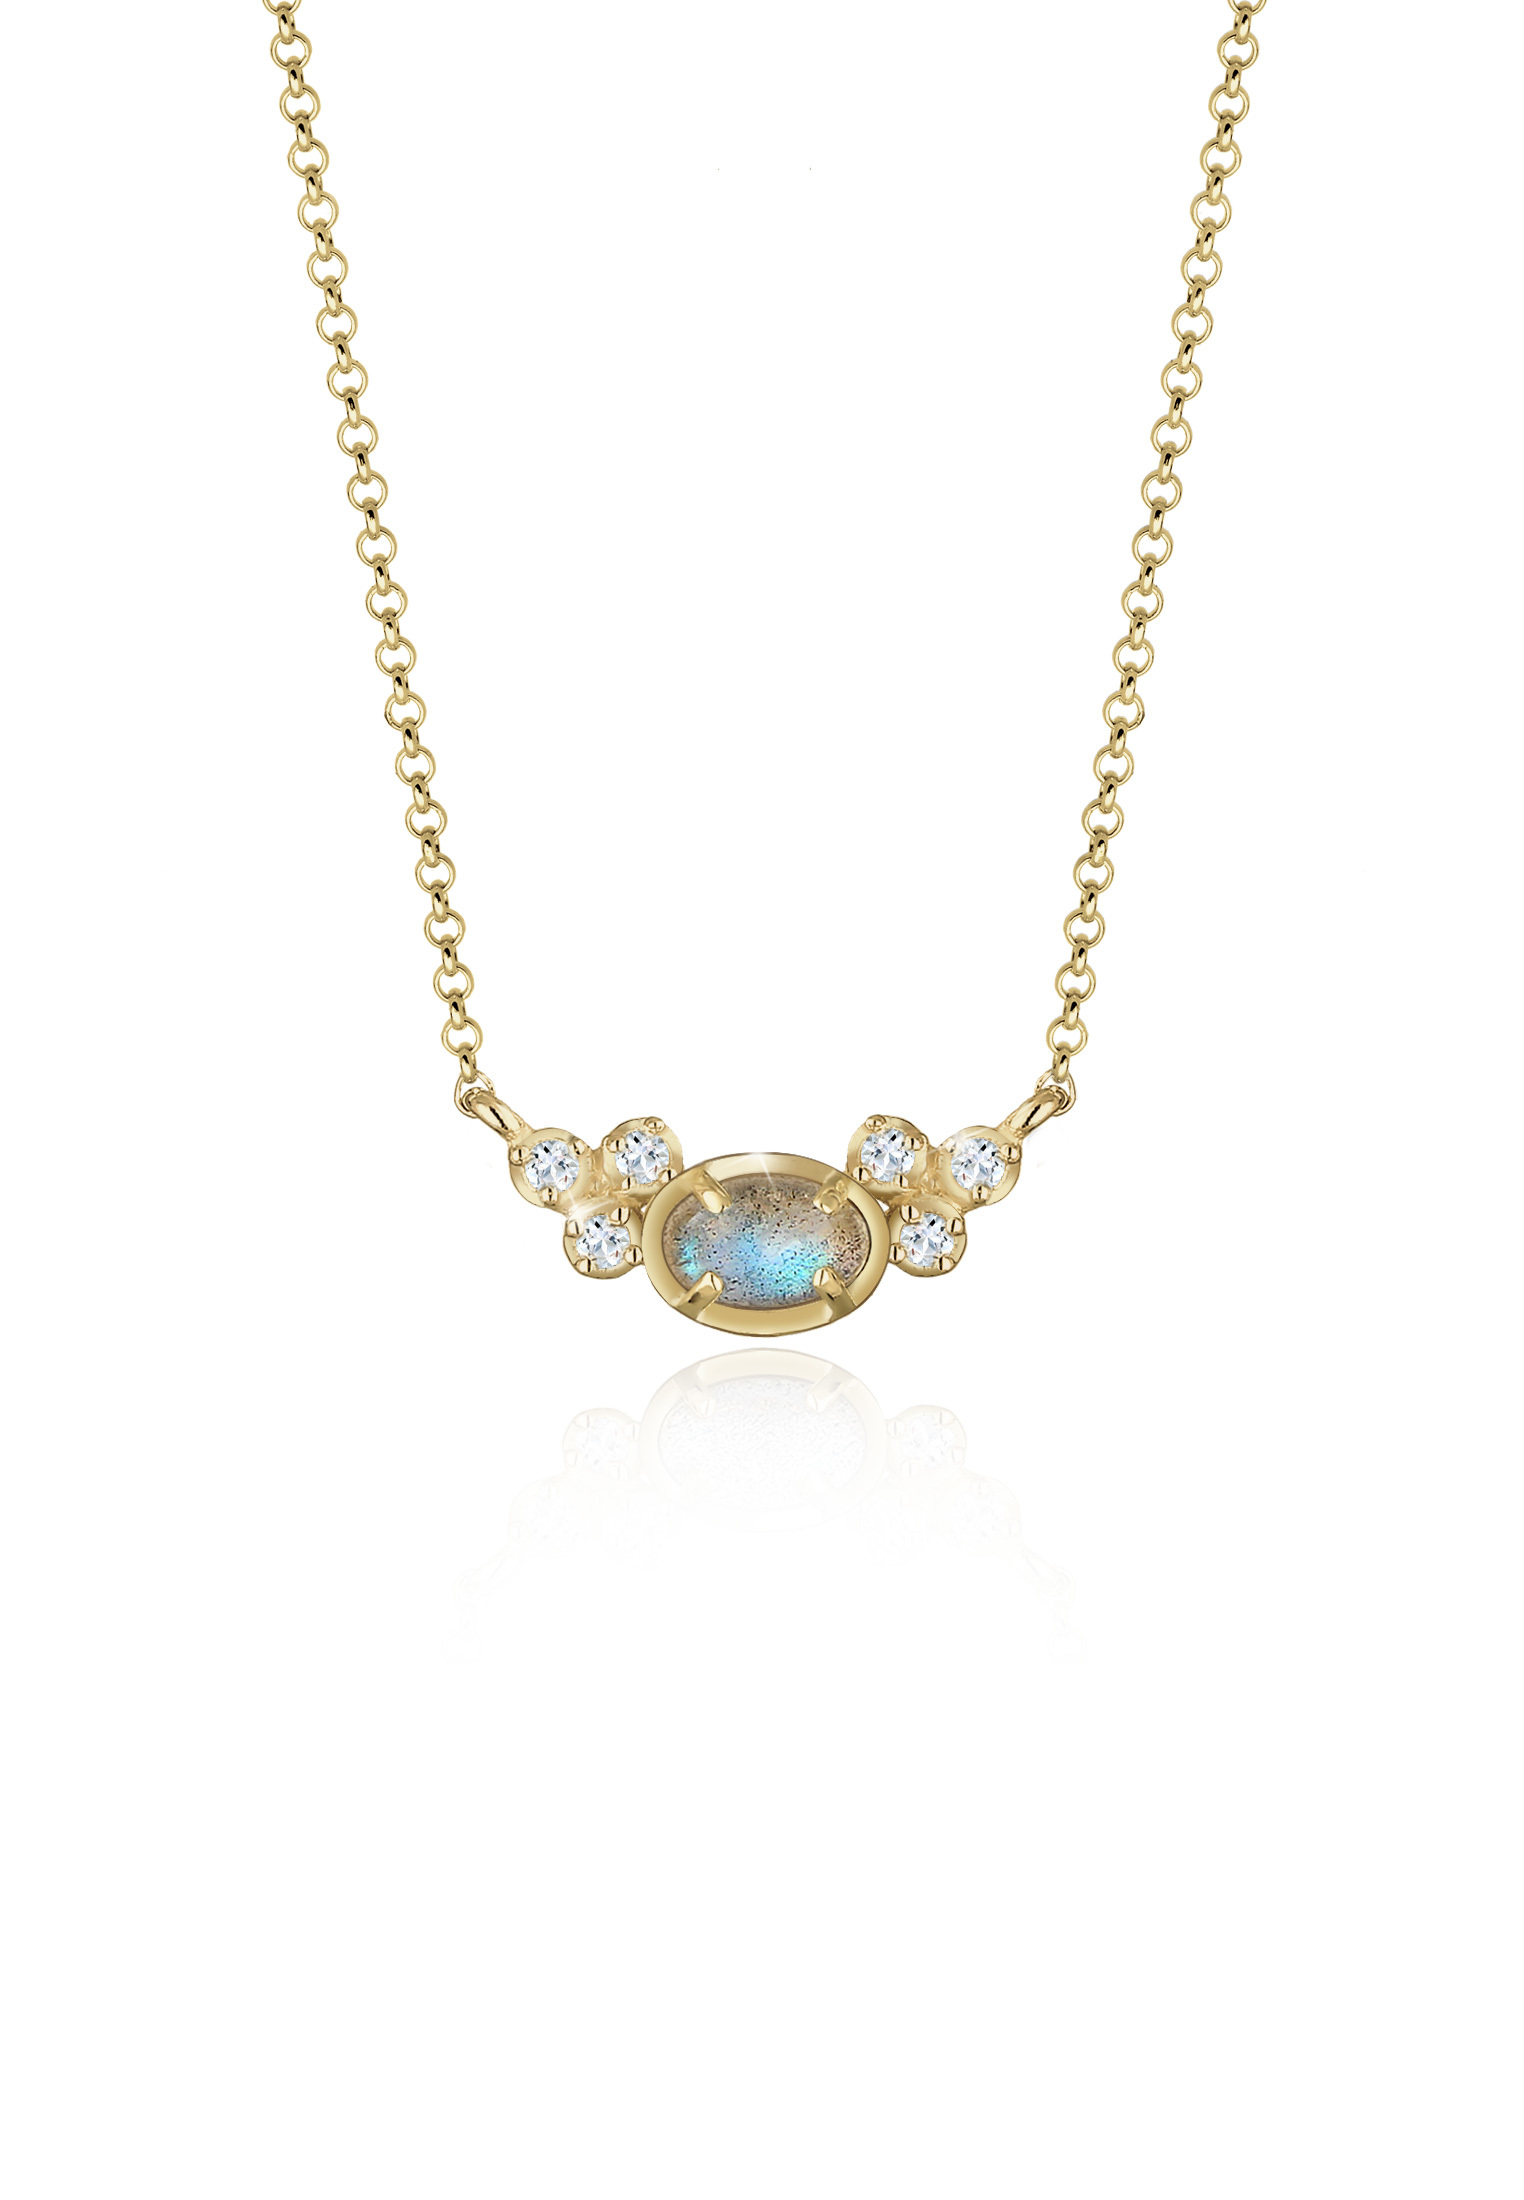 Halskette   Topas ( Weiß )   925 Sterling Silber vergoldet